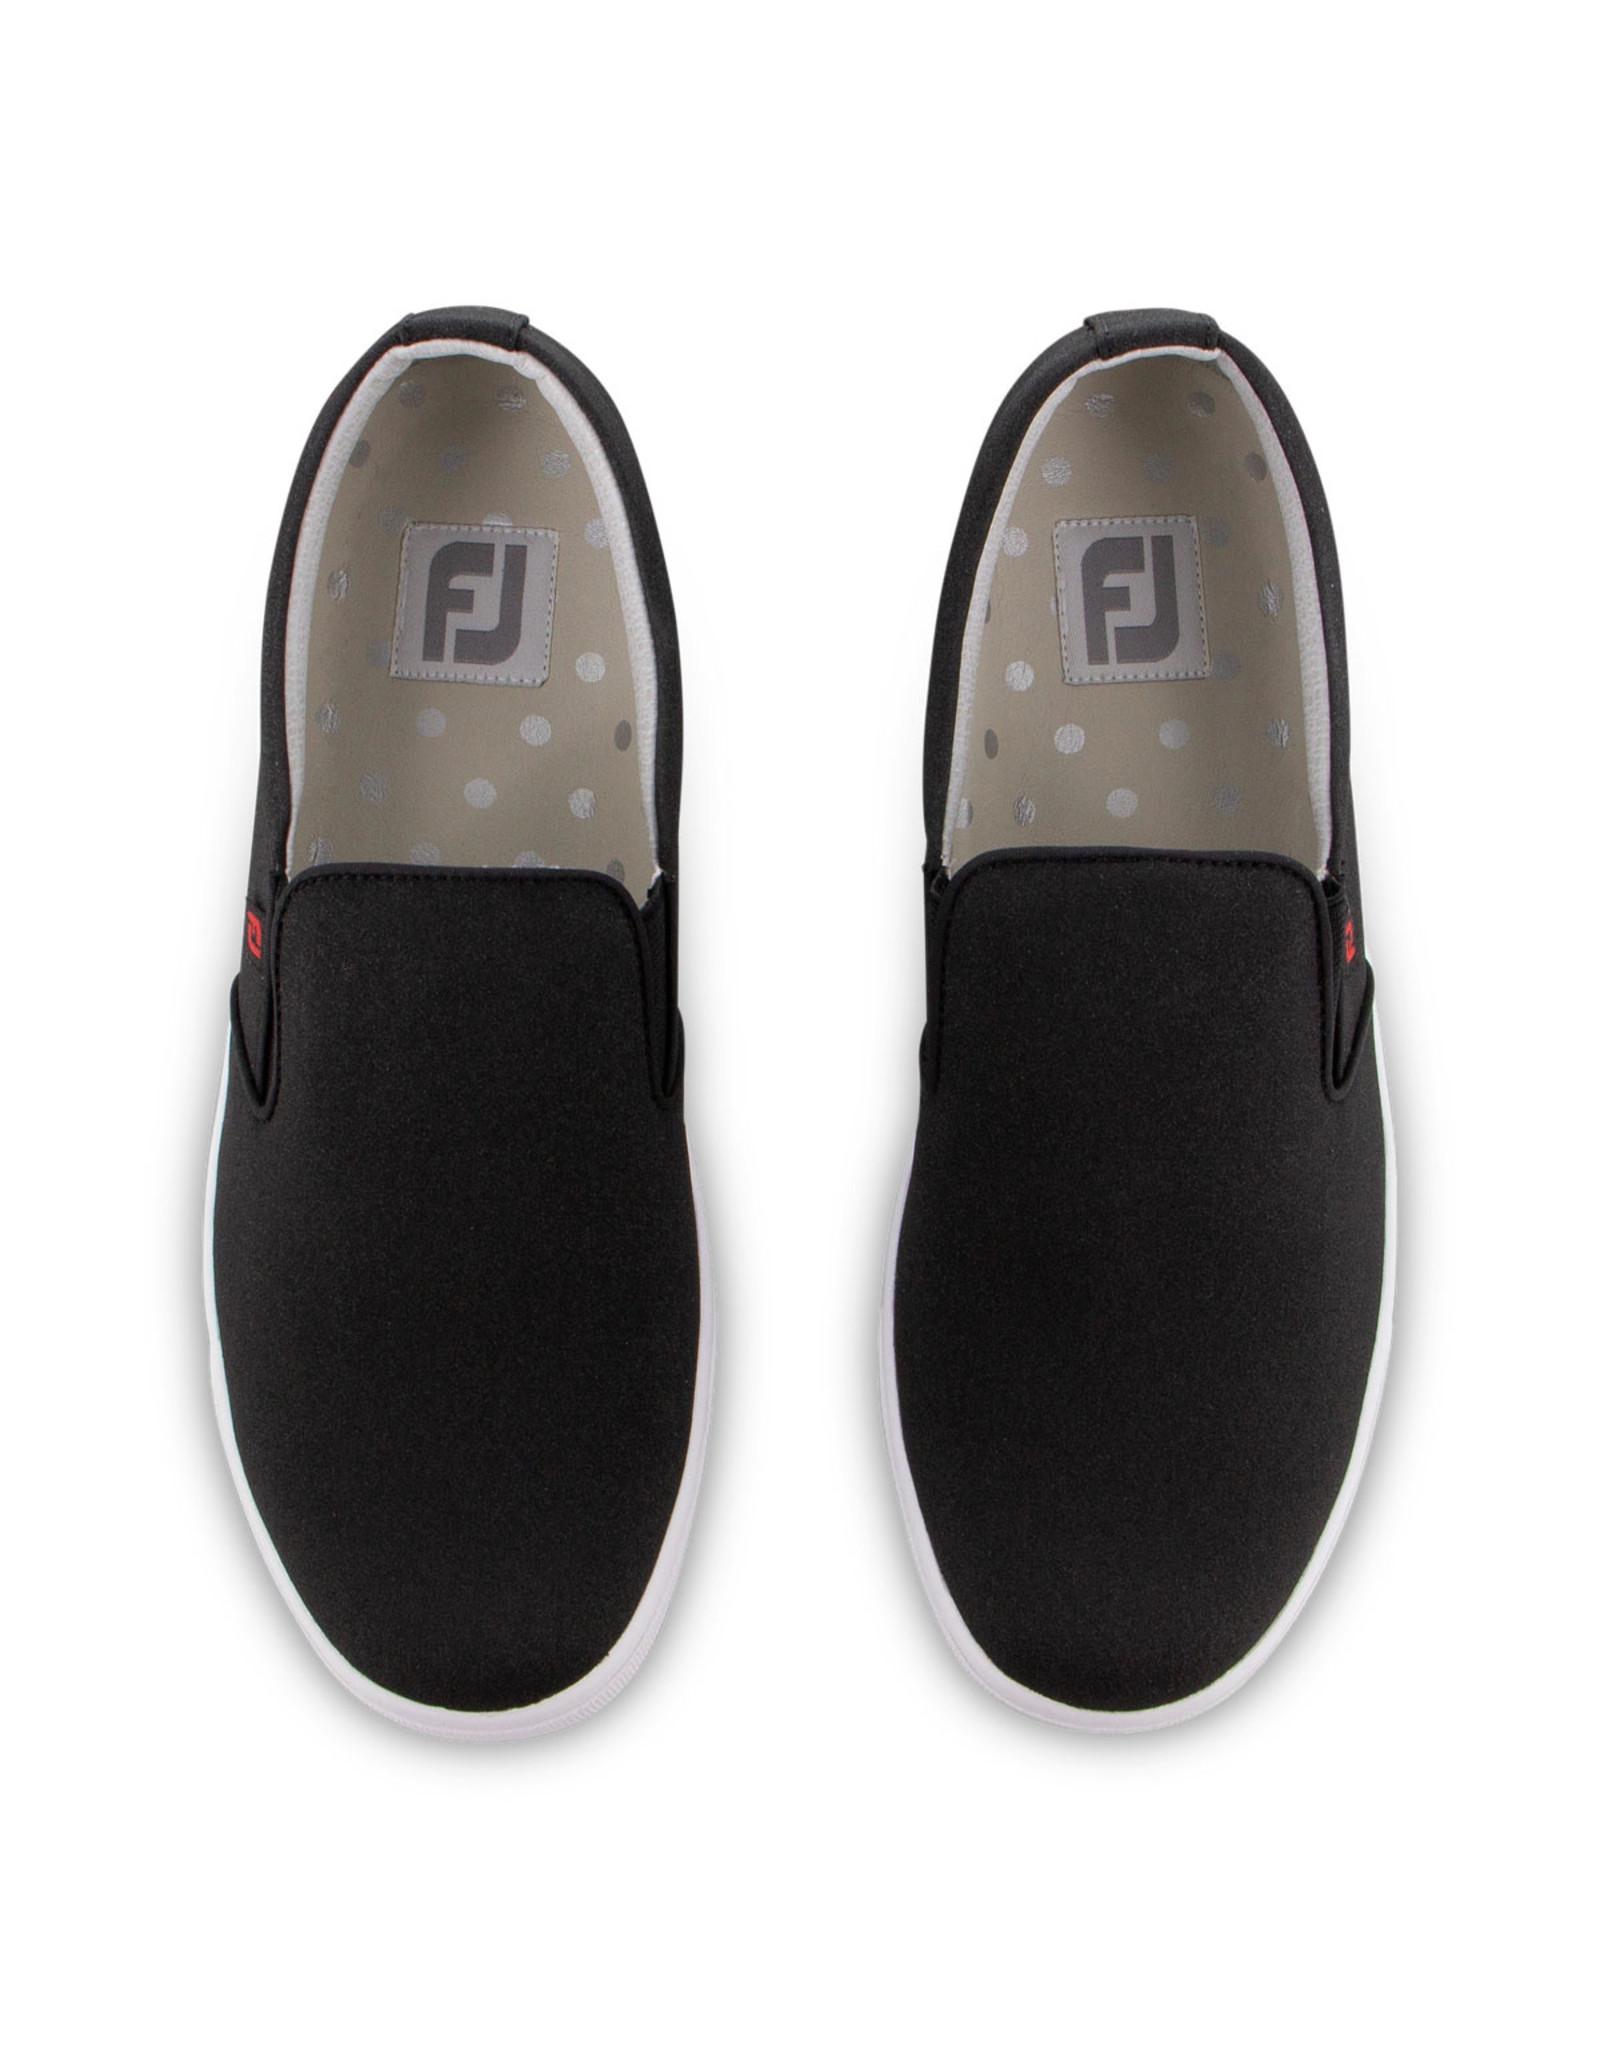 FootJoy FootJoy Sport Retro All Black